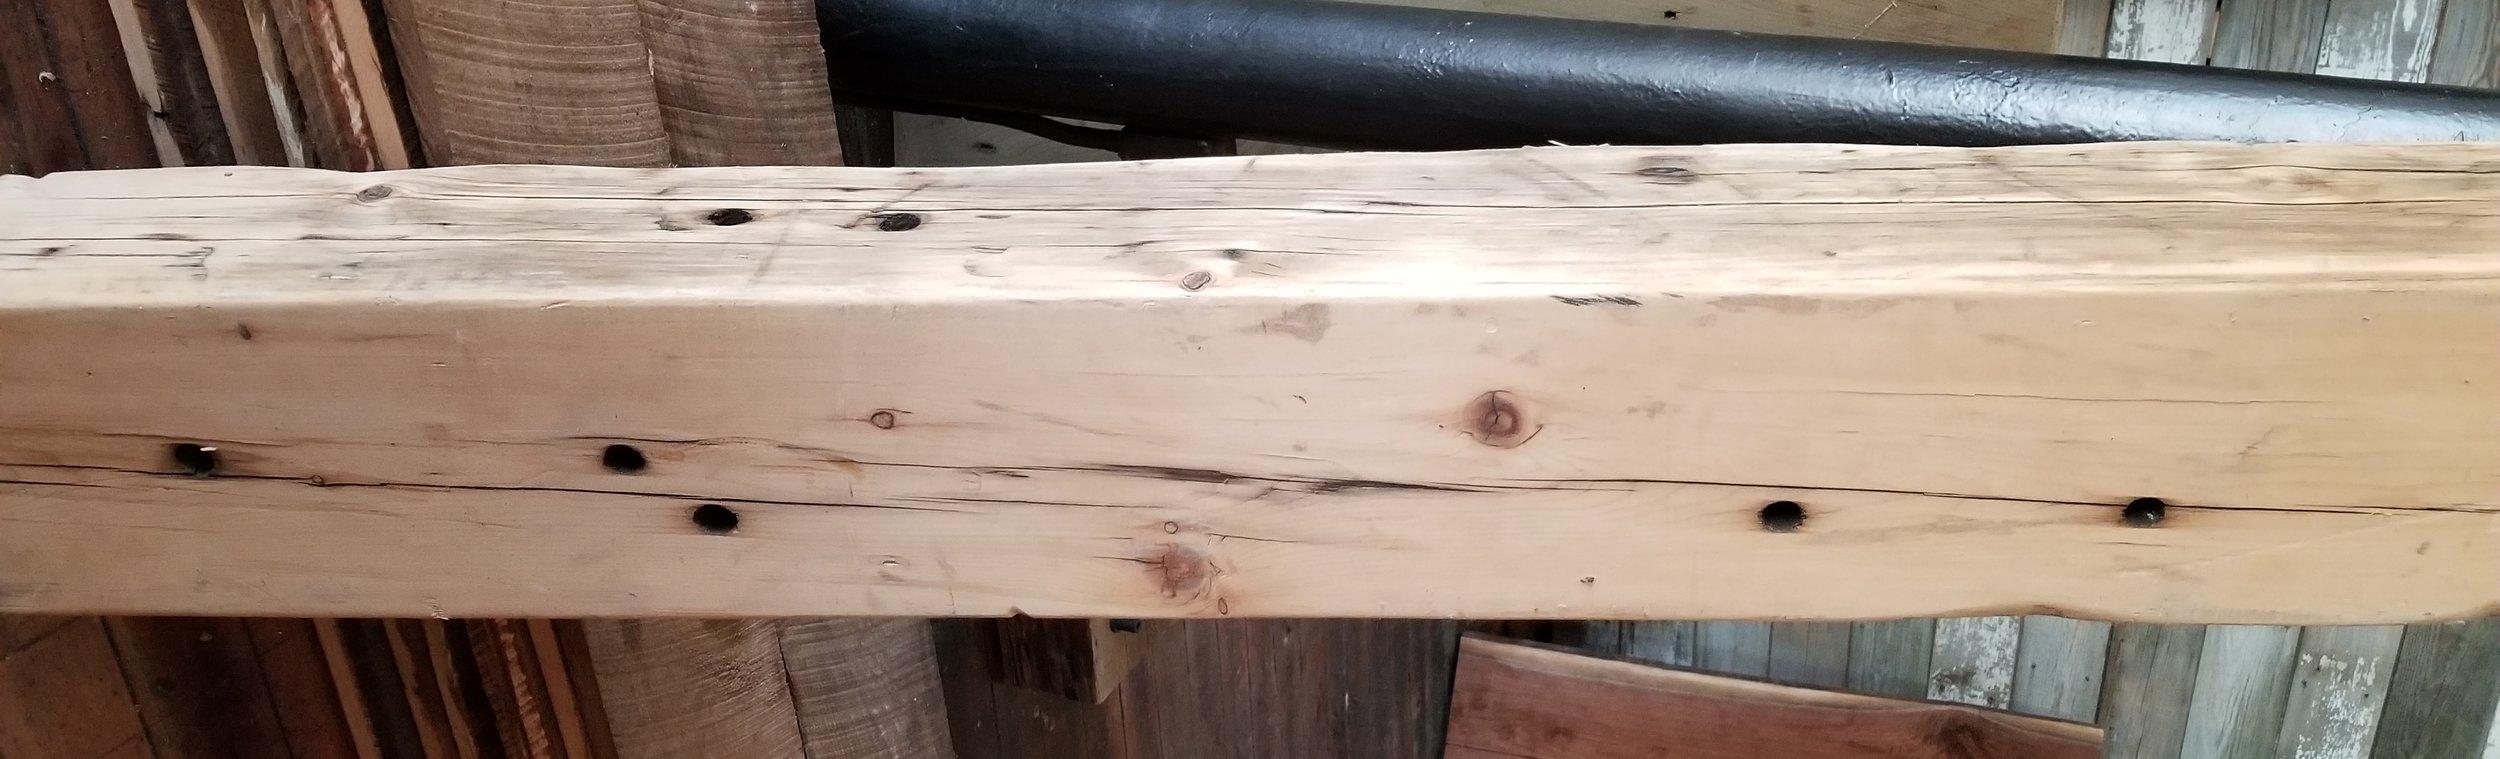 White Pine- Milled  Mantles- Ceiling Beams- Wall panel- Doors- Table tops